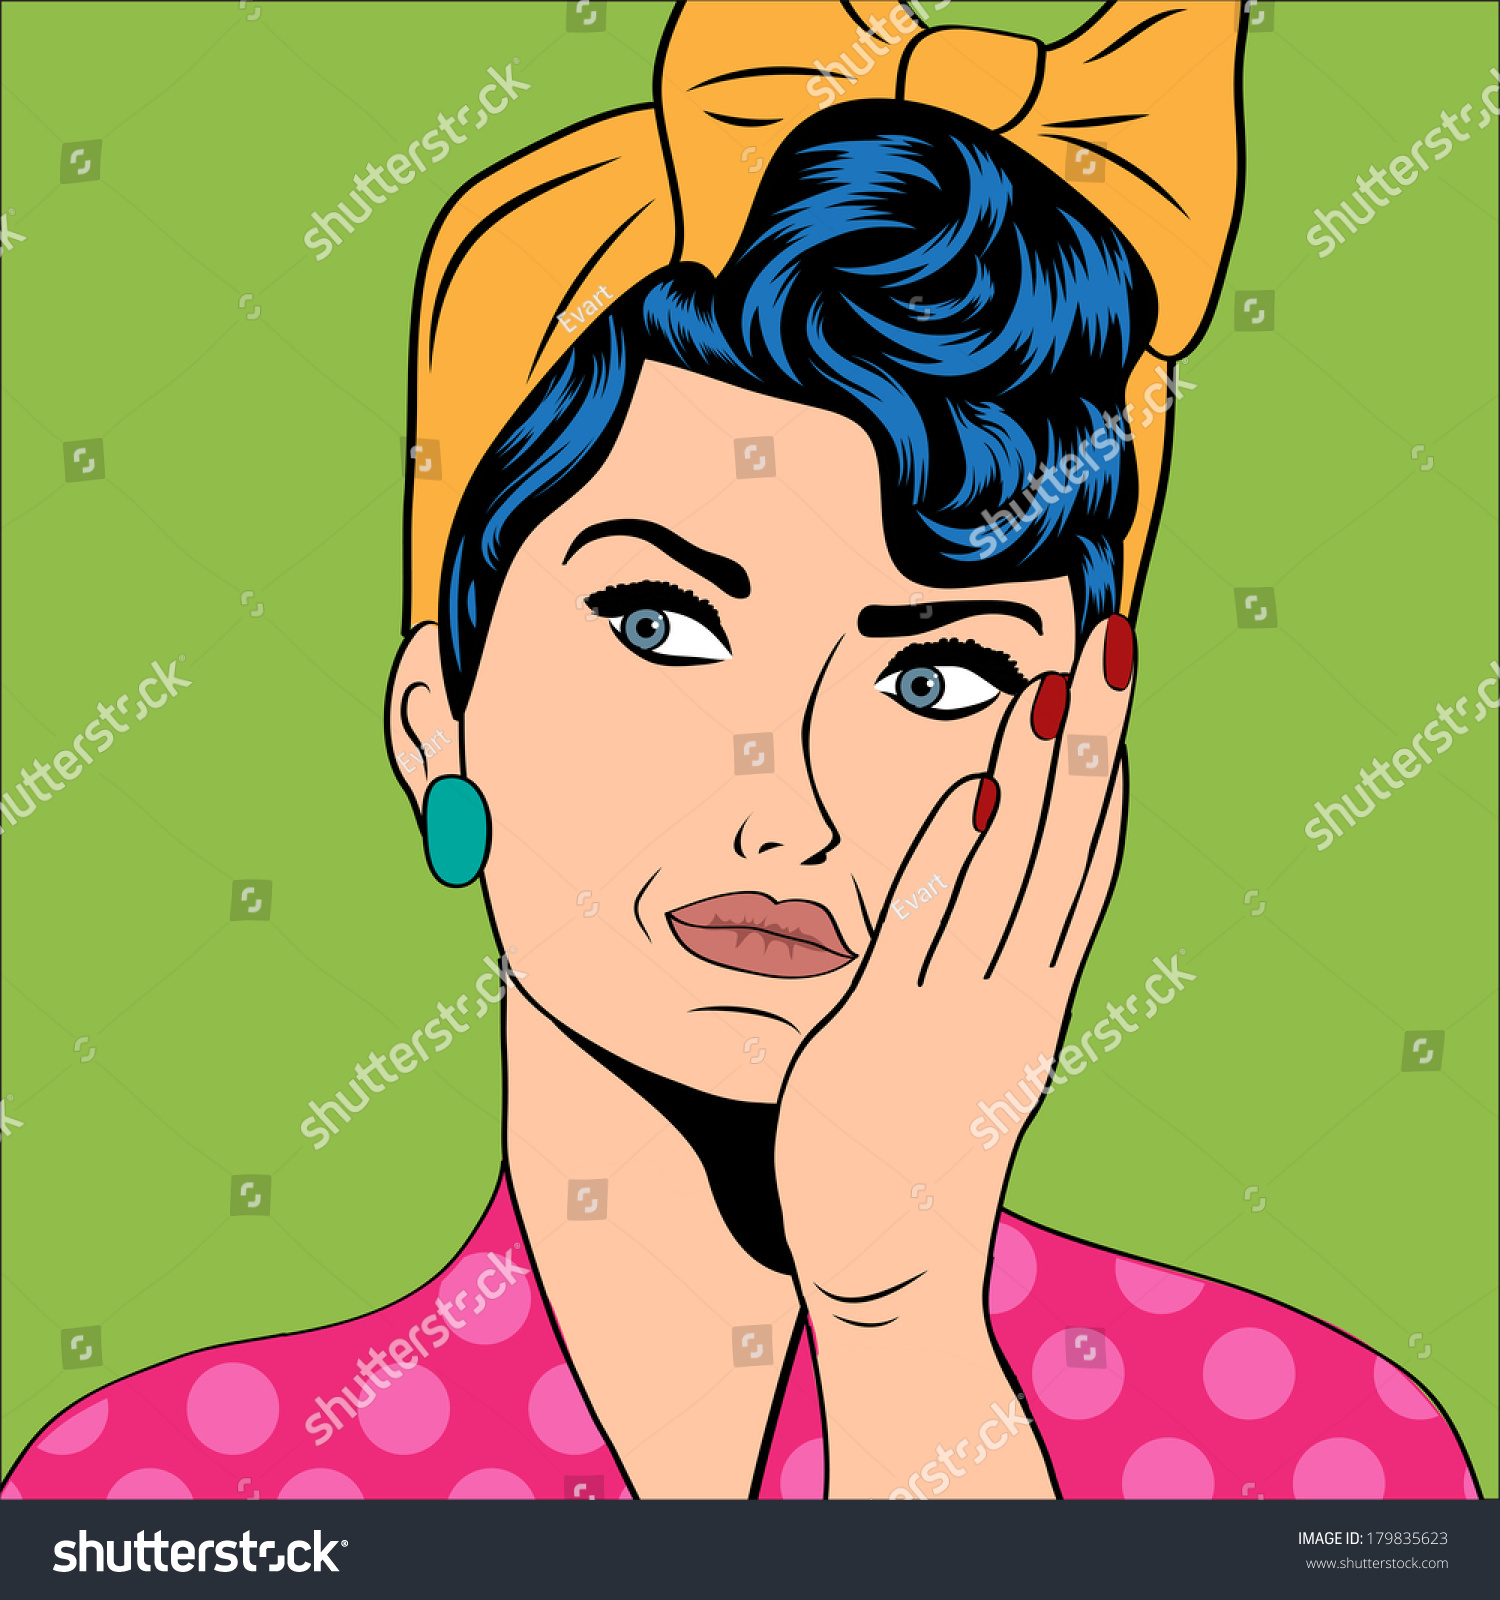 Cute Retro Woman Comics Style Vector Stock Vector 179835623 ...